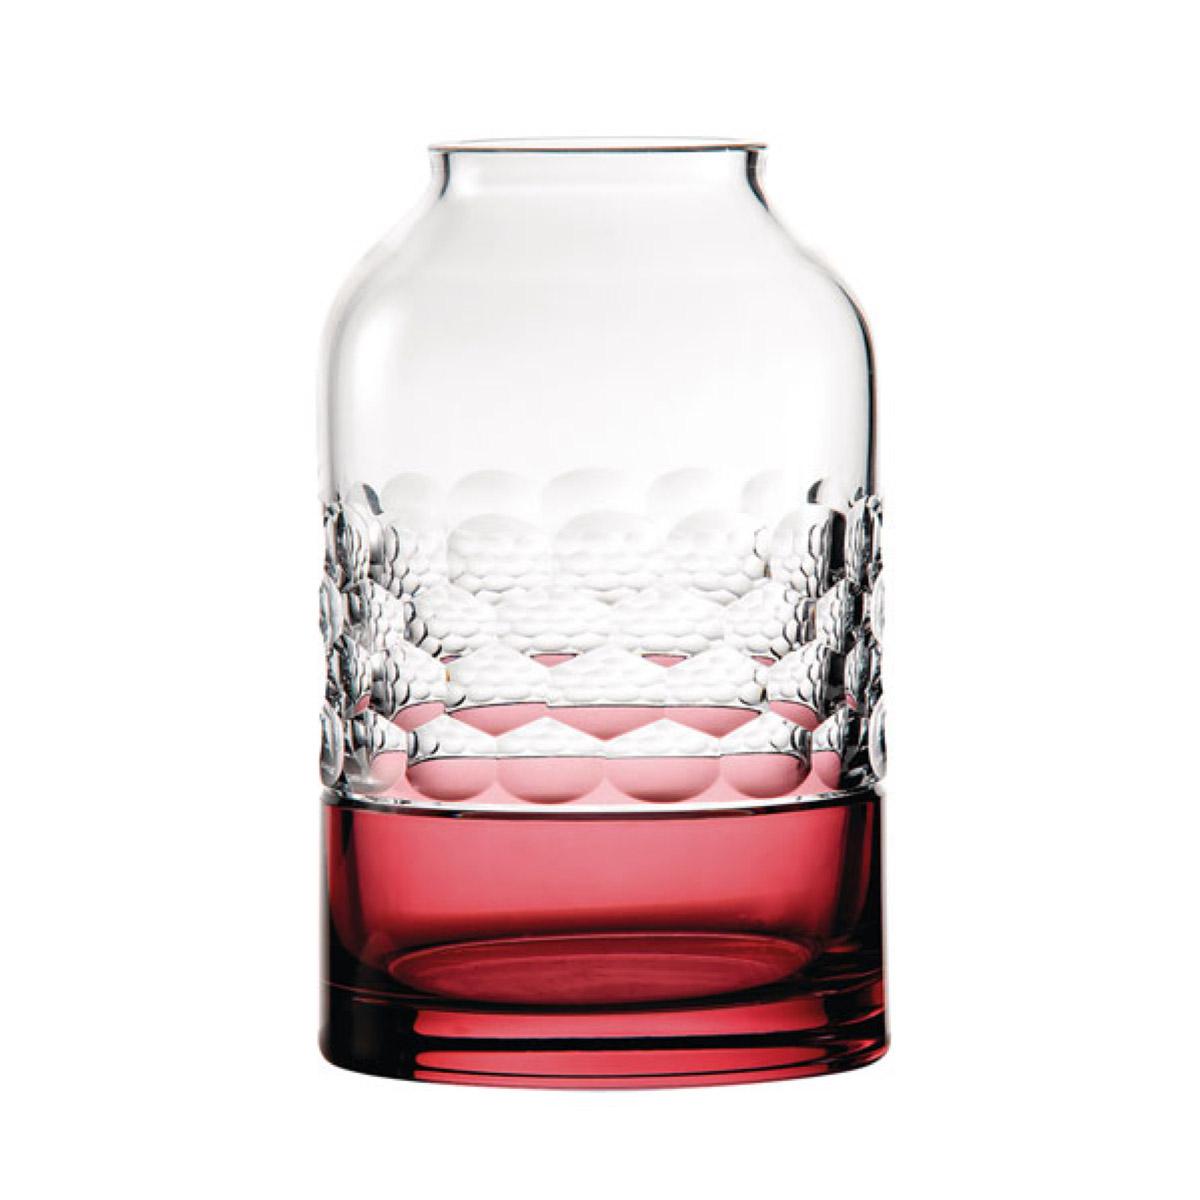 Half and Half Rose Vase